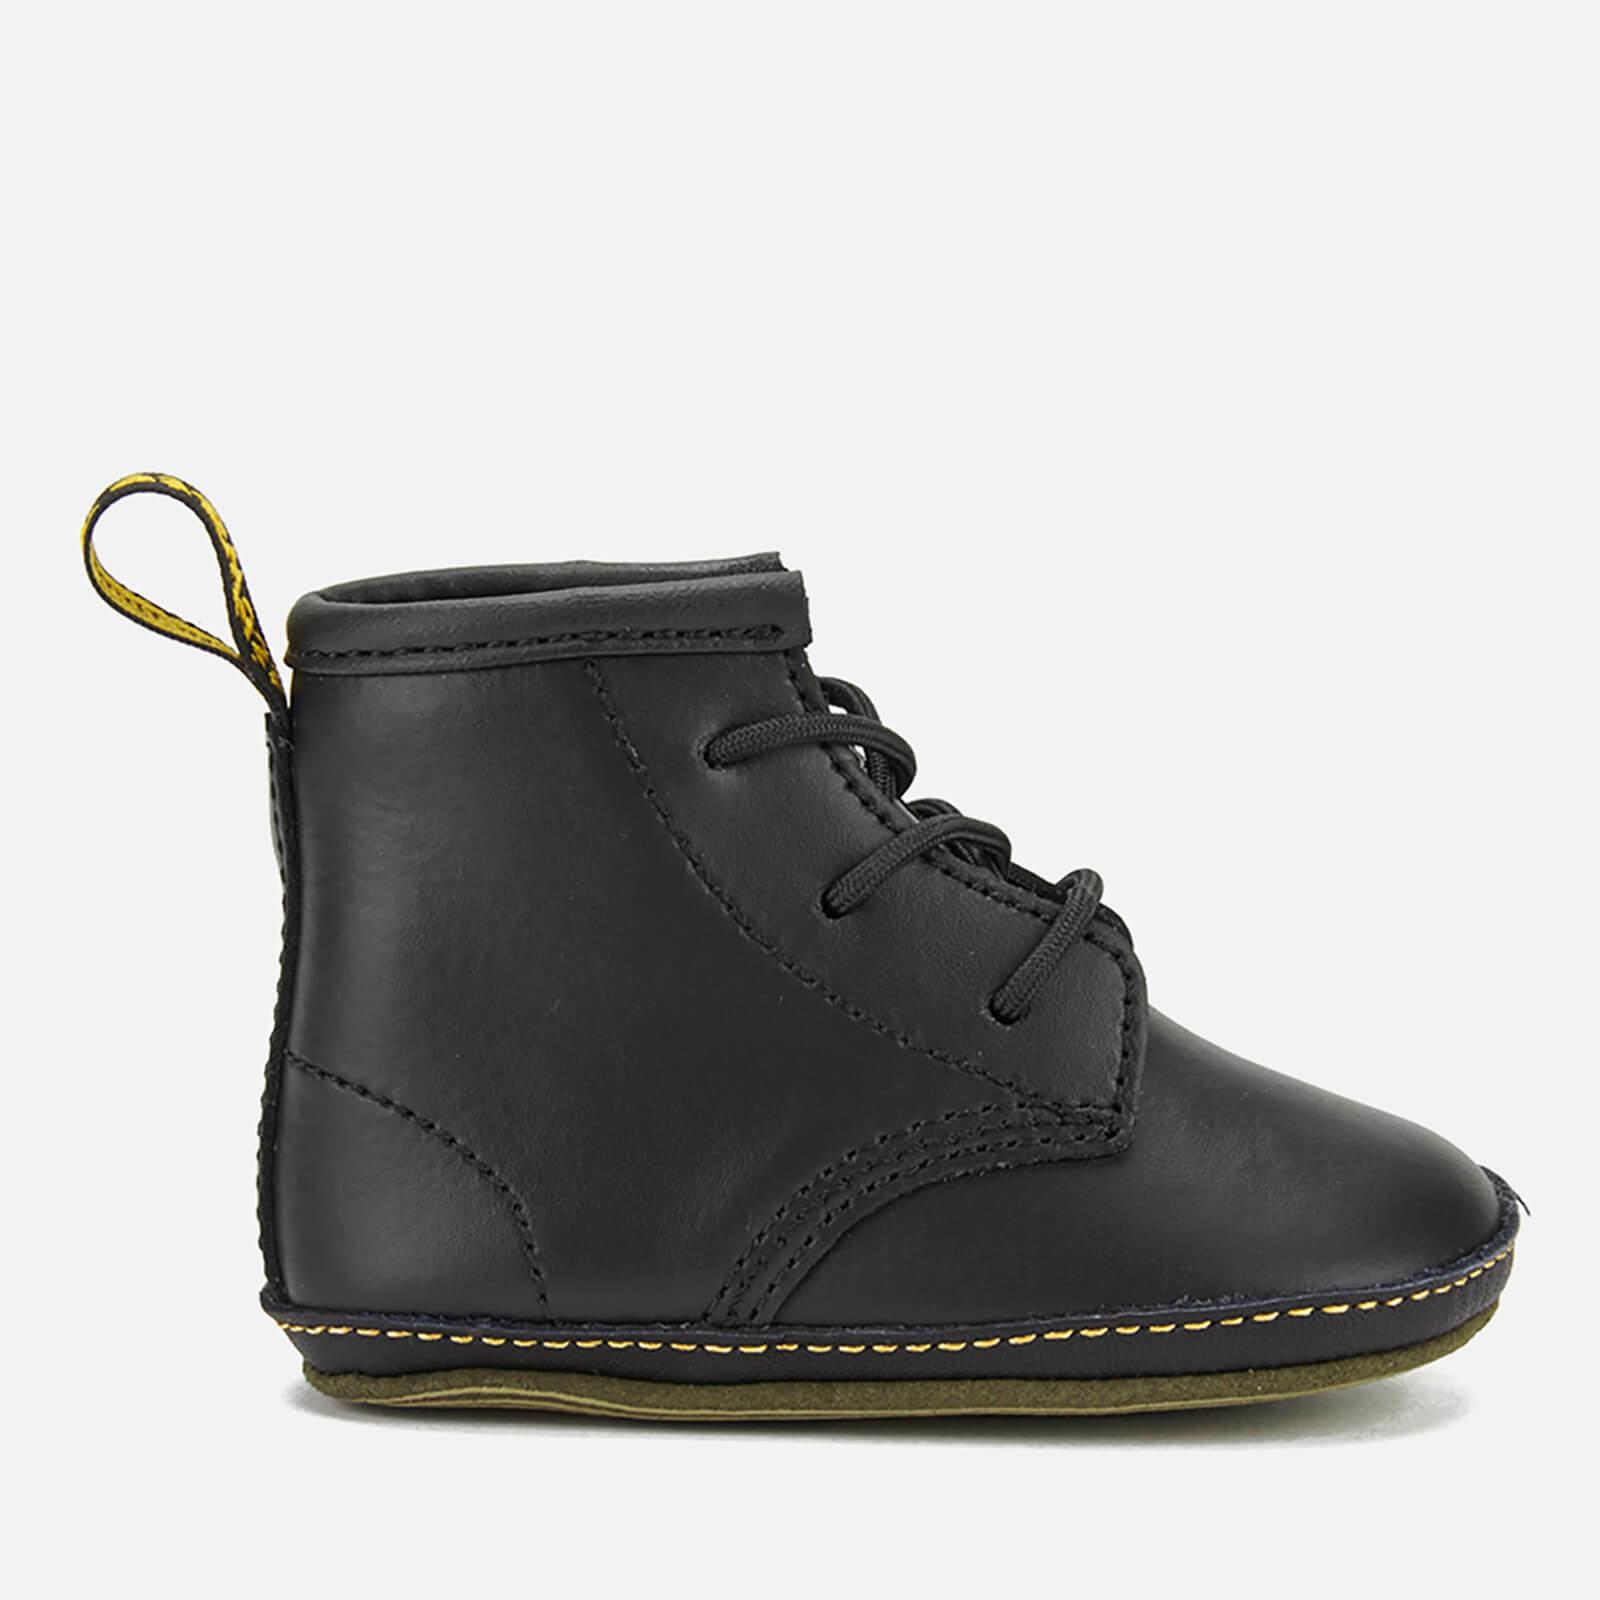 Dr. Martens Babies Auburn Kid Lamper Leather Boots - Black - UK 3 Baby - Black